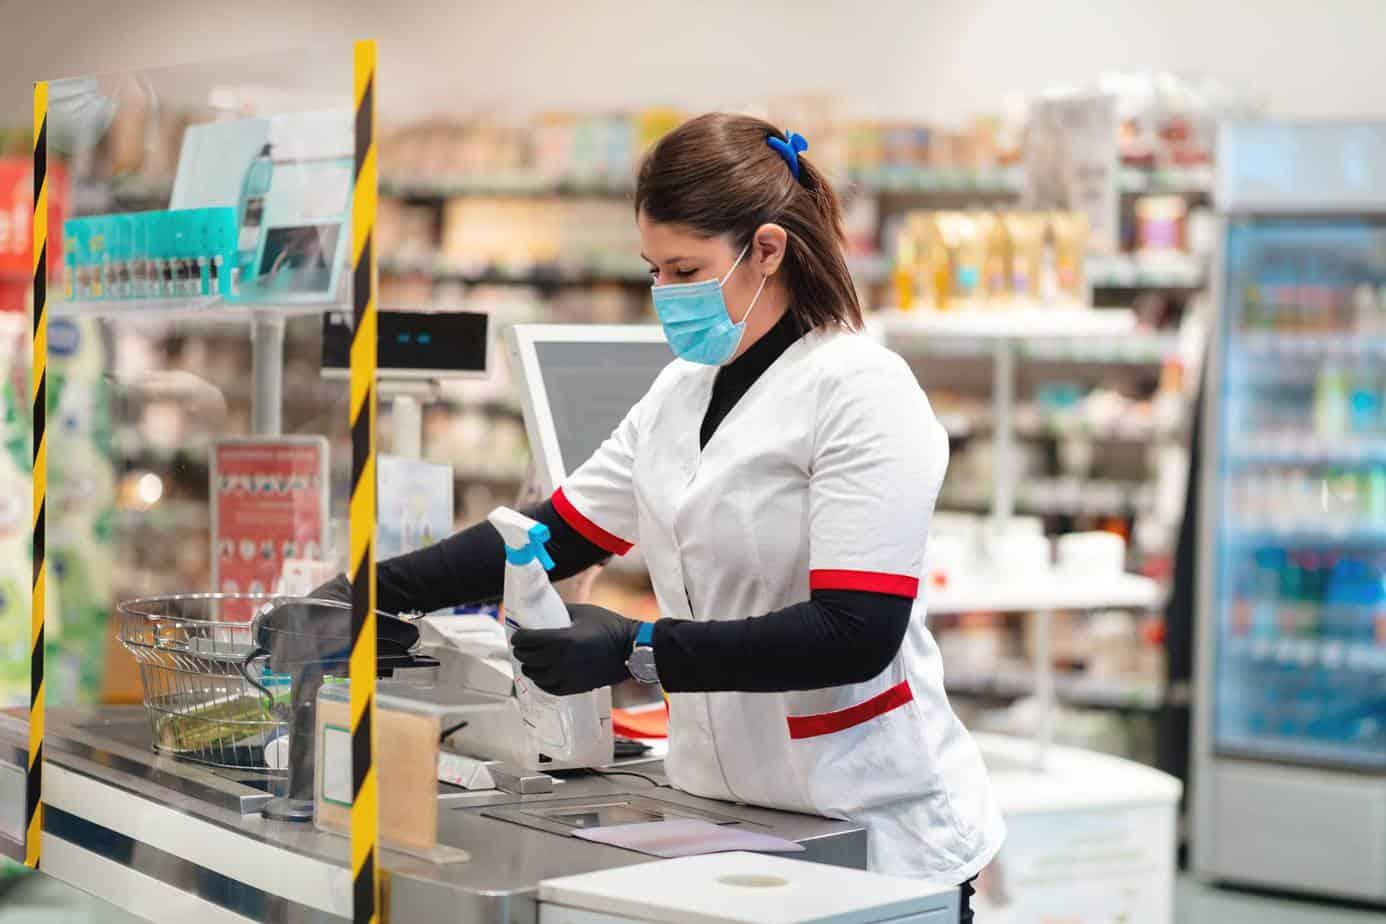 woman behind glass plexiglass checkout counter sneeze guard divider toronto